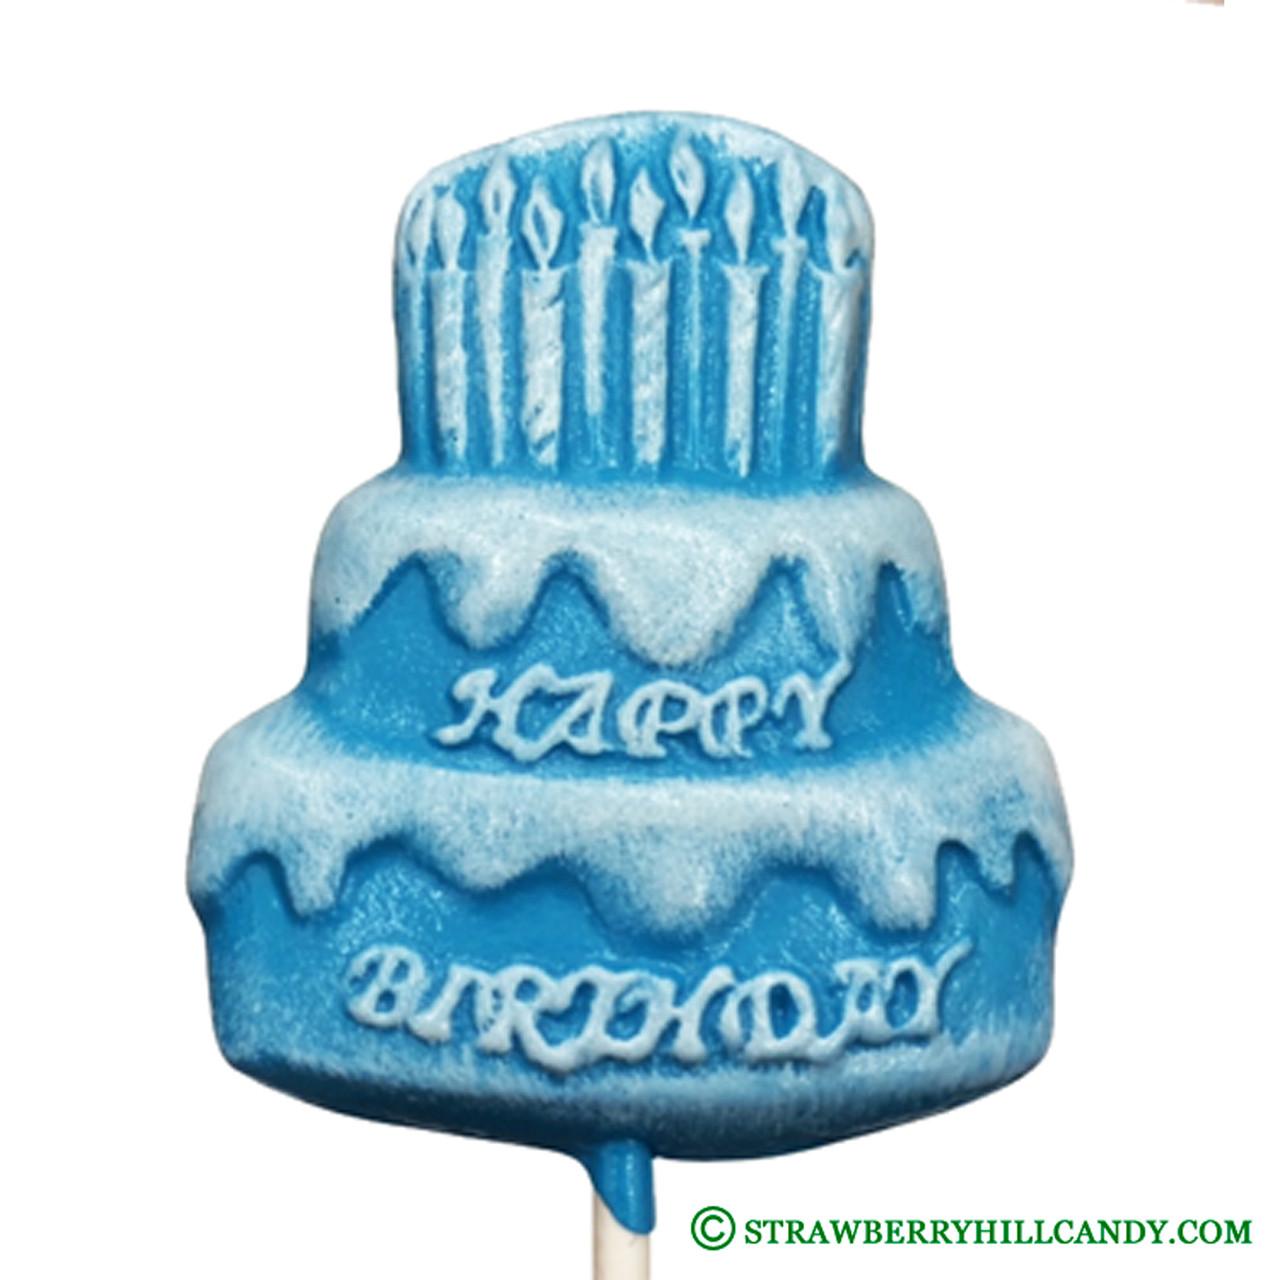 Phenomenal Happy Birthday Cake Lollipop Strawberry Hill Candy Birthday Cards Printable Inklcafe Filternl